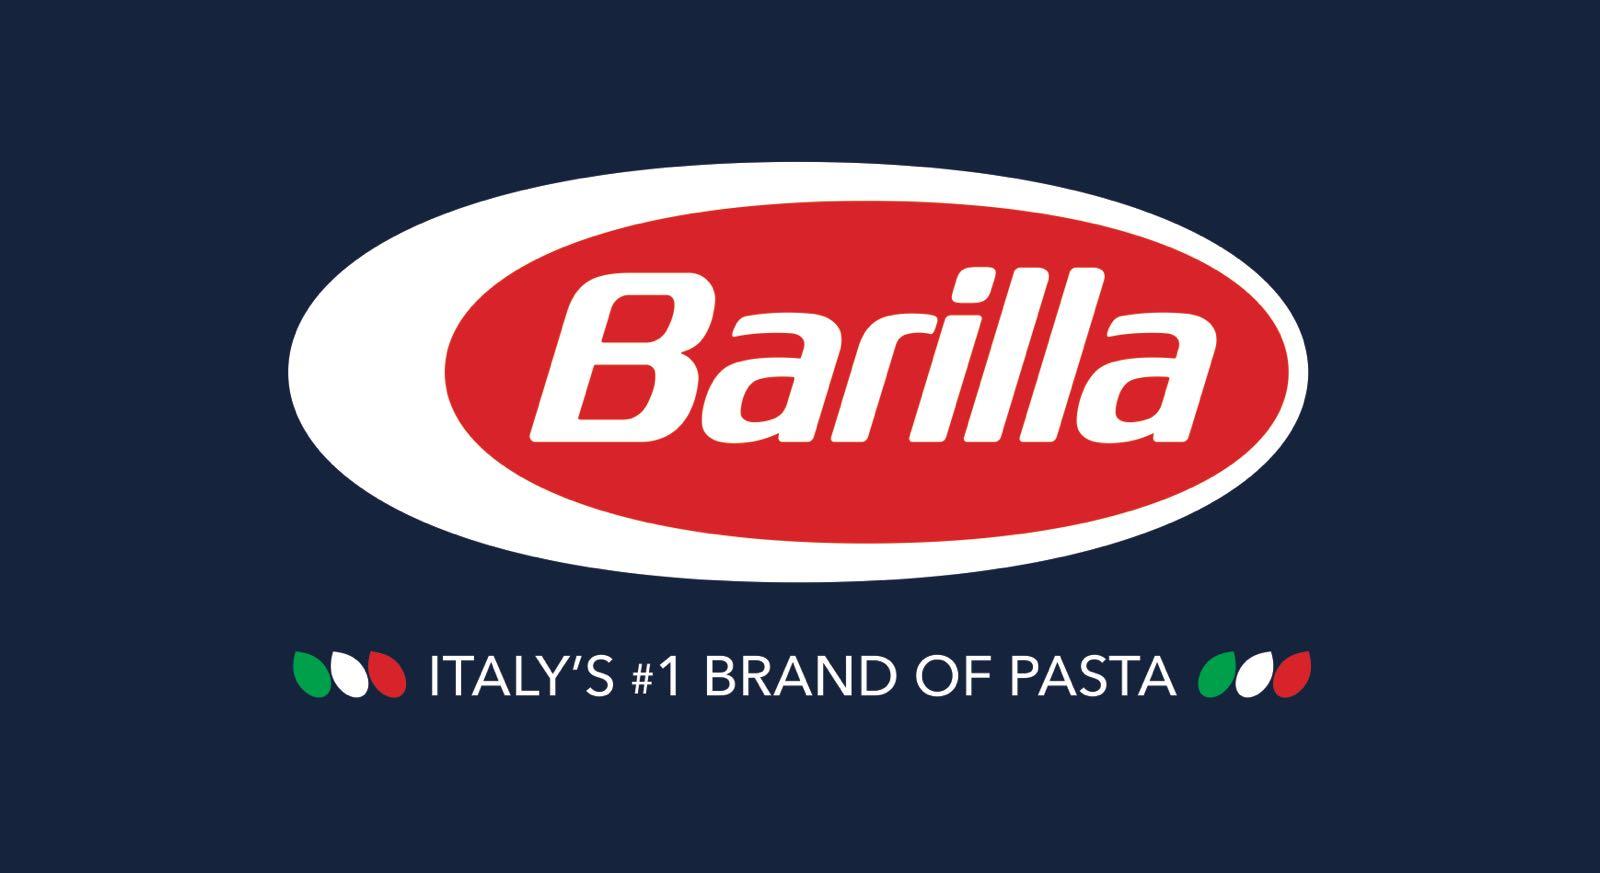 Euro Food Brands Ltd / Barilla